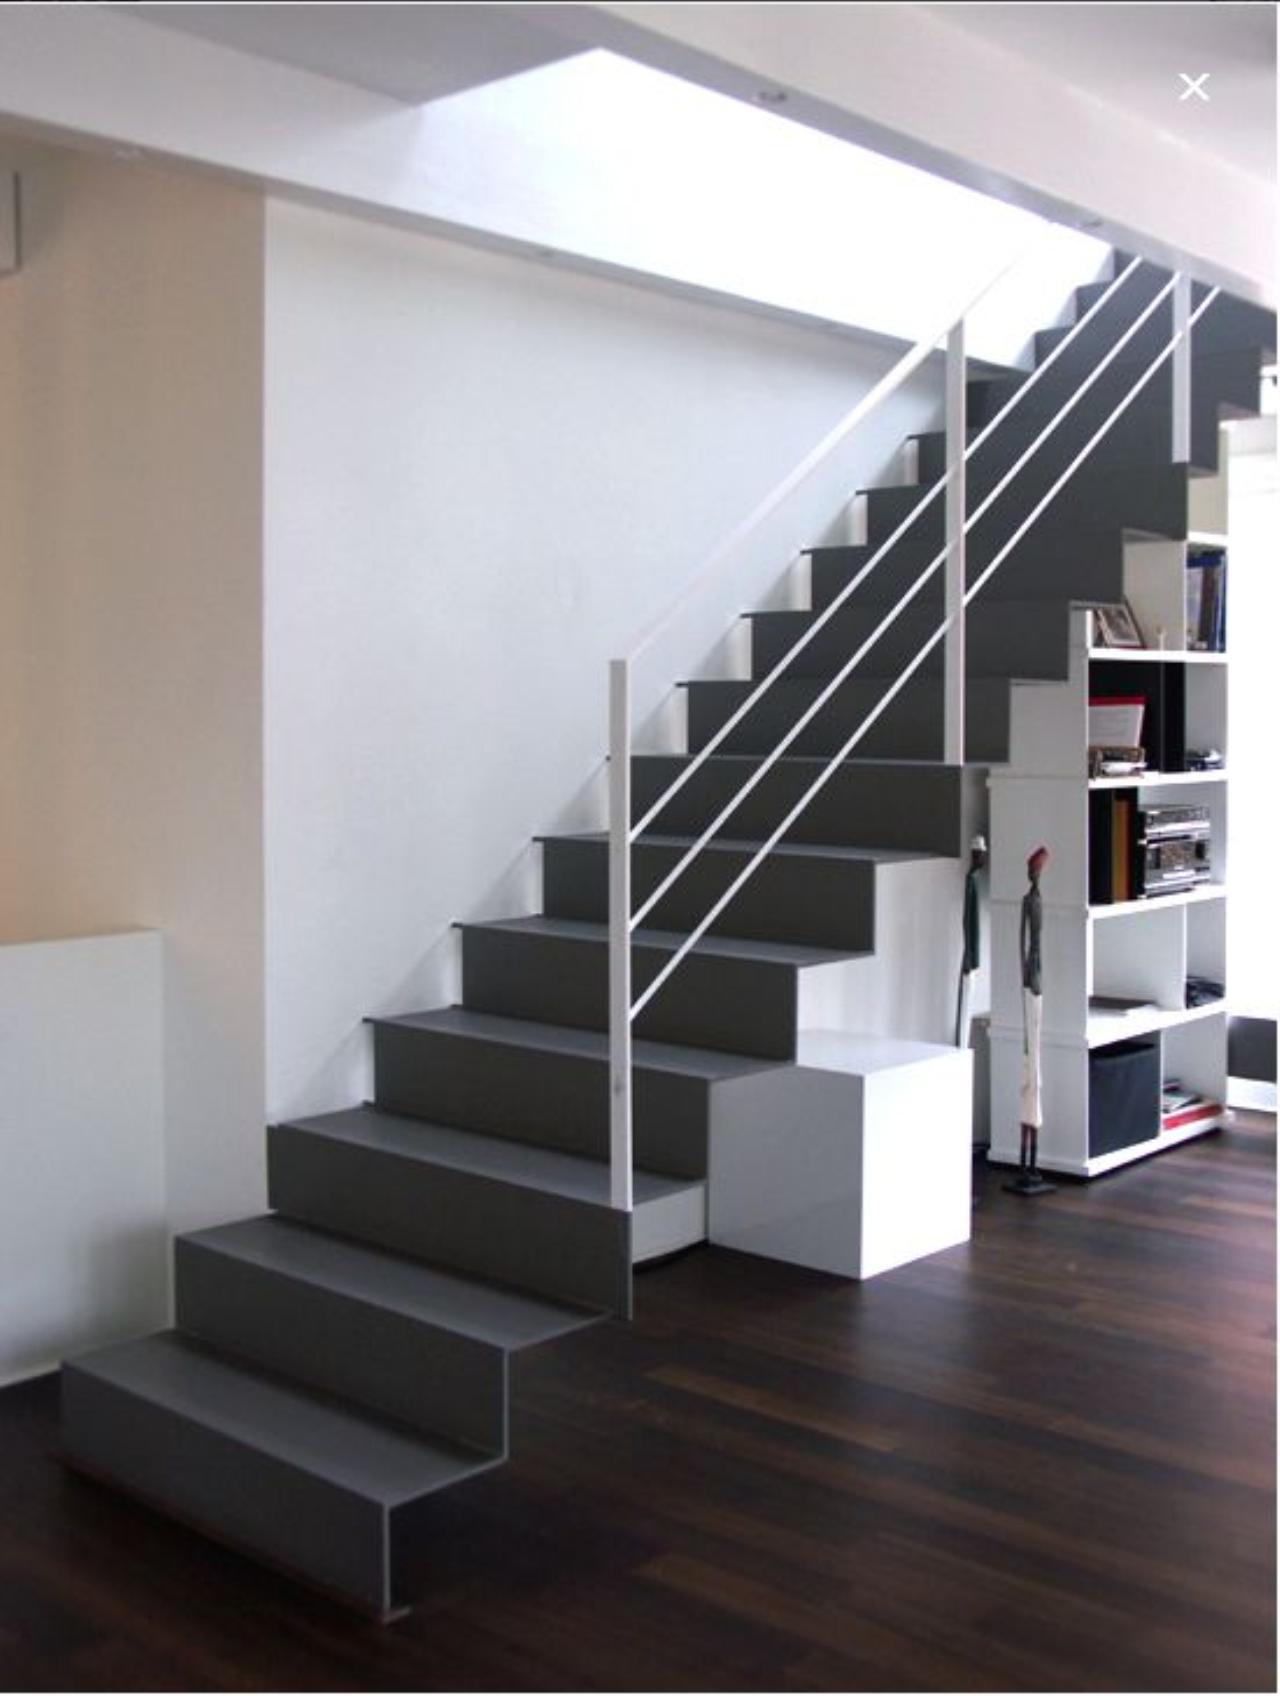 faltwerktreppe aus stahl forum auf. Black Bedroom Furniture Sets. Home Design Ideas